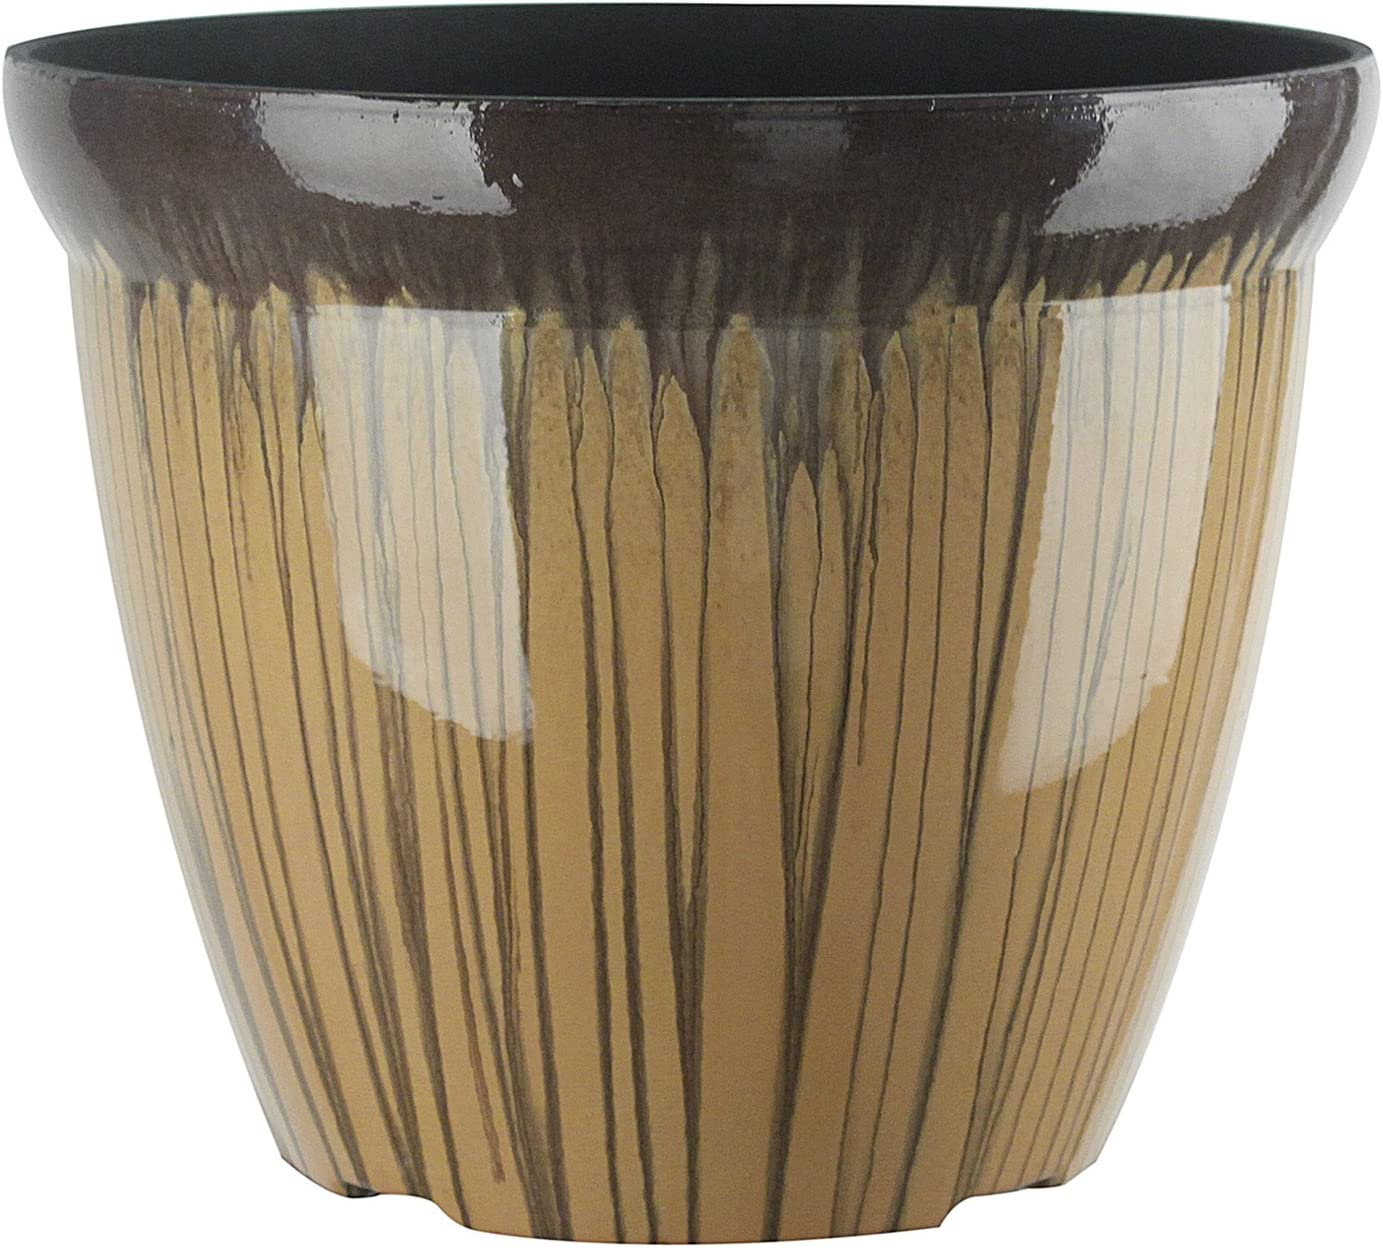 FANTASTIC :) 11-INCH Round Drum Shape Shinny Finish Decorative Plastic Planters Flower Pot-(1-Pack, DoubleGlaze Orange)